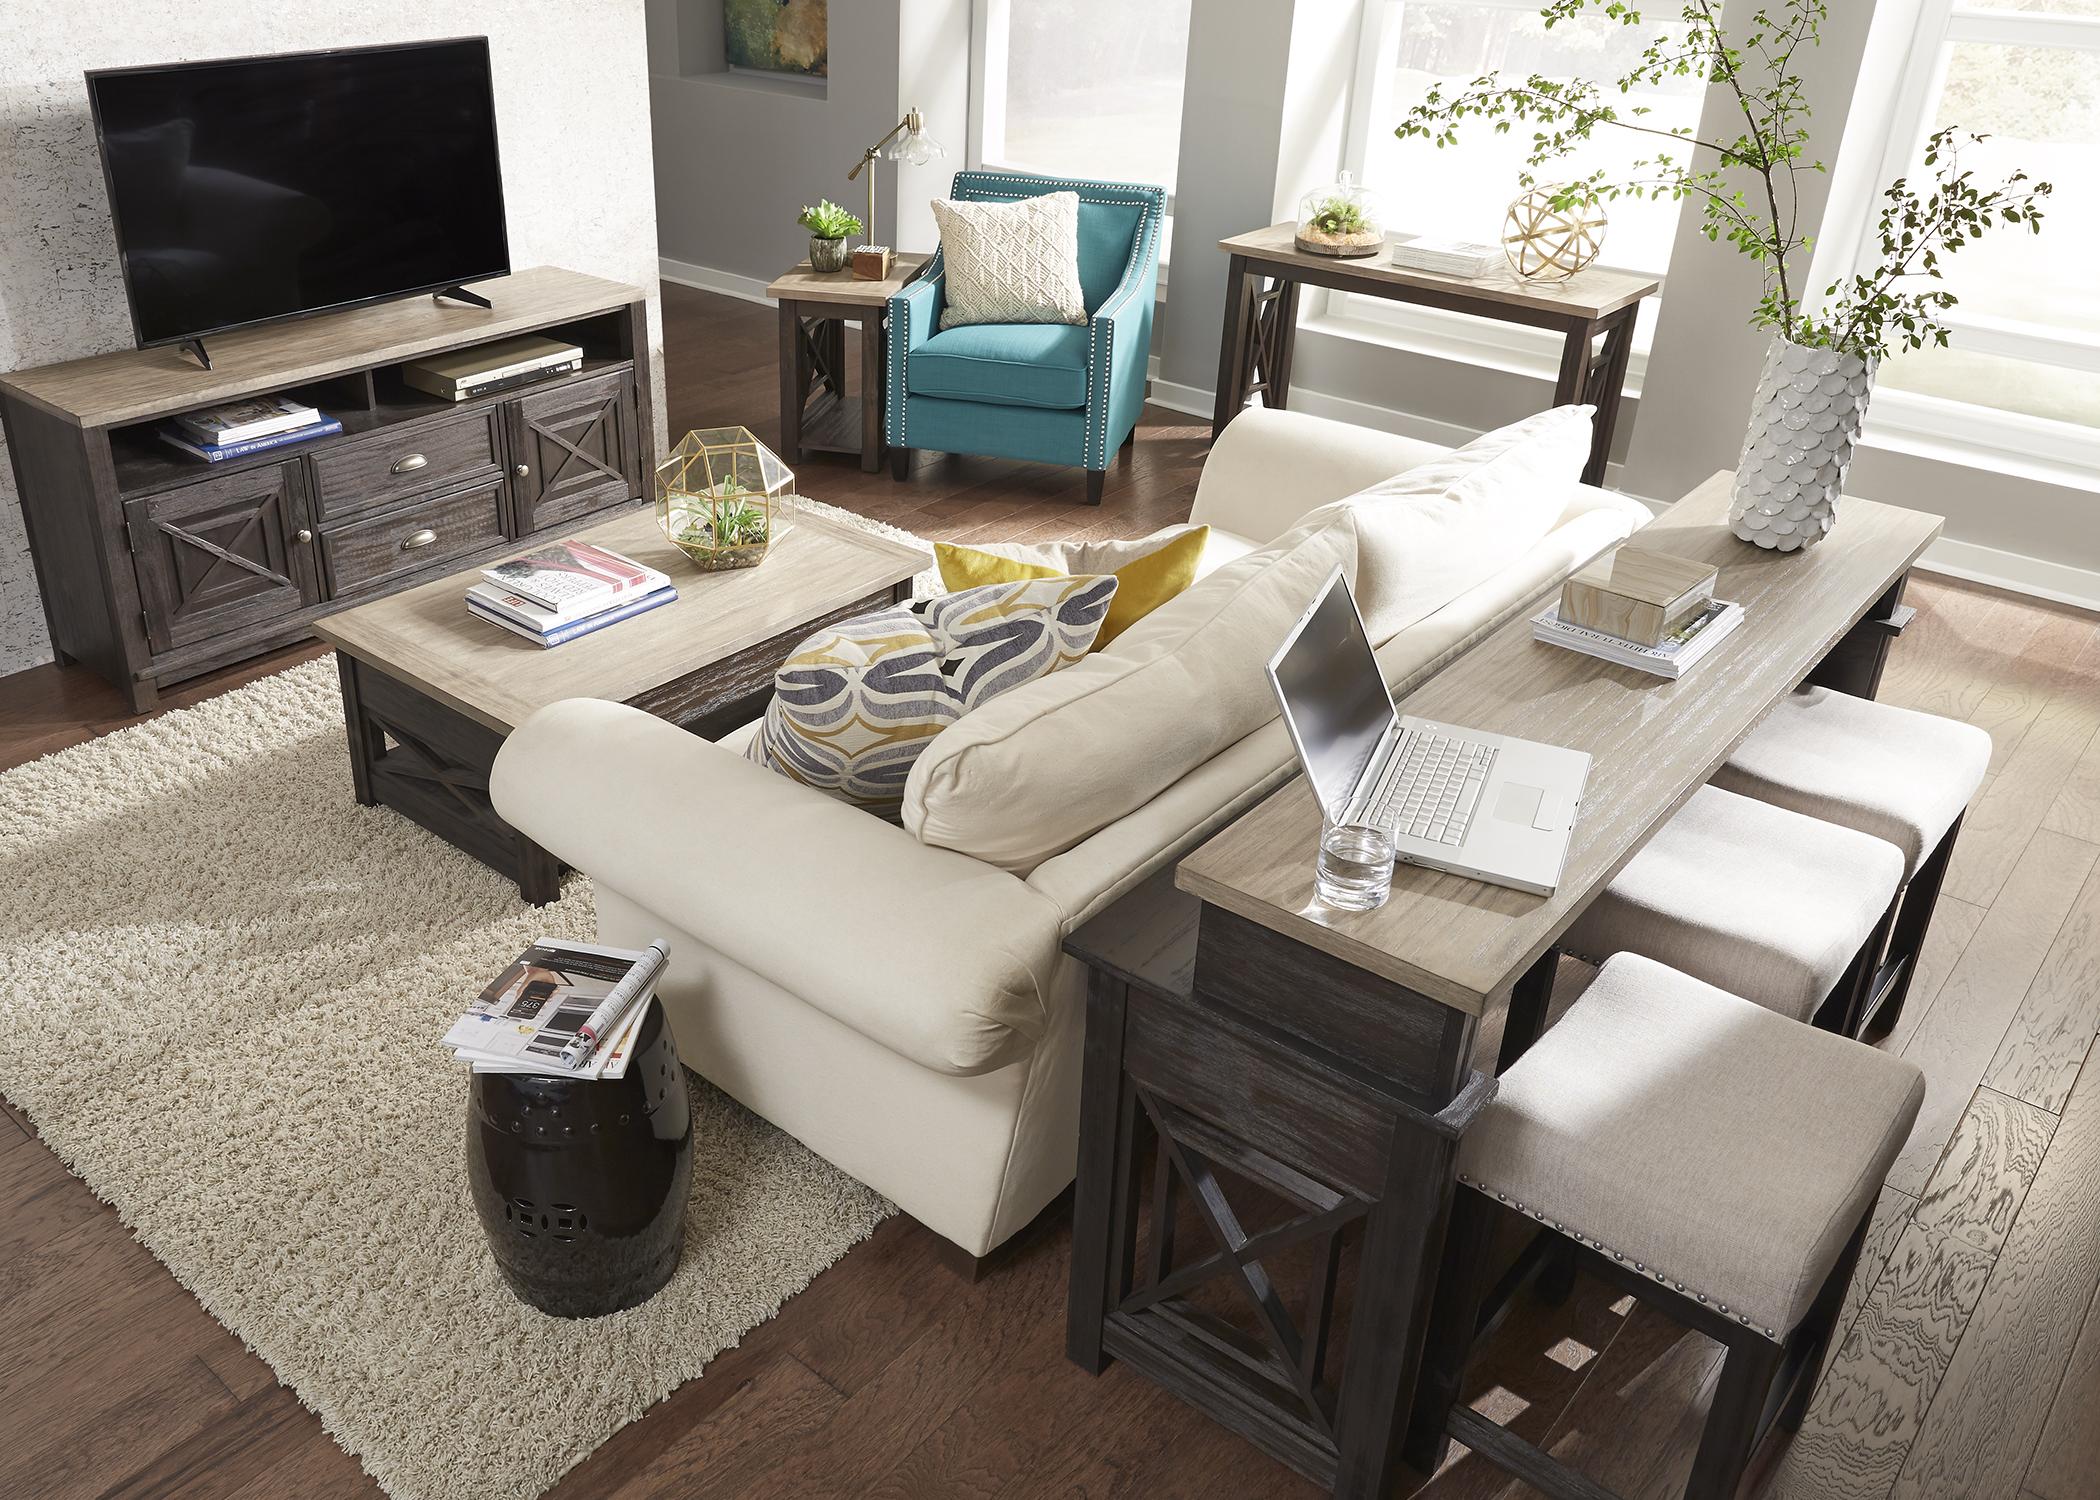 Model: 422-OT1010 | Liberty Furniture Cocktail Table